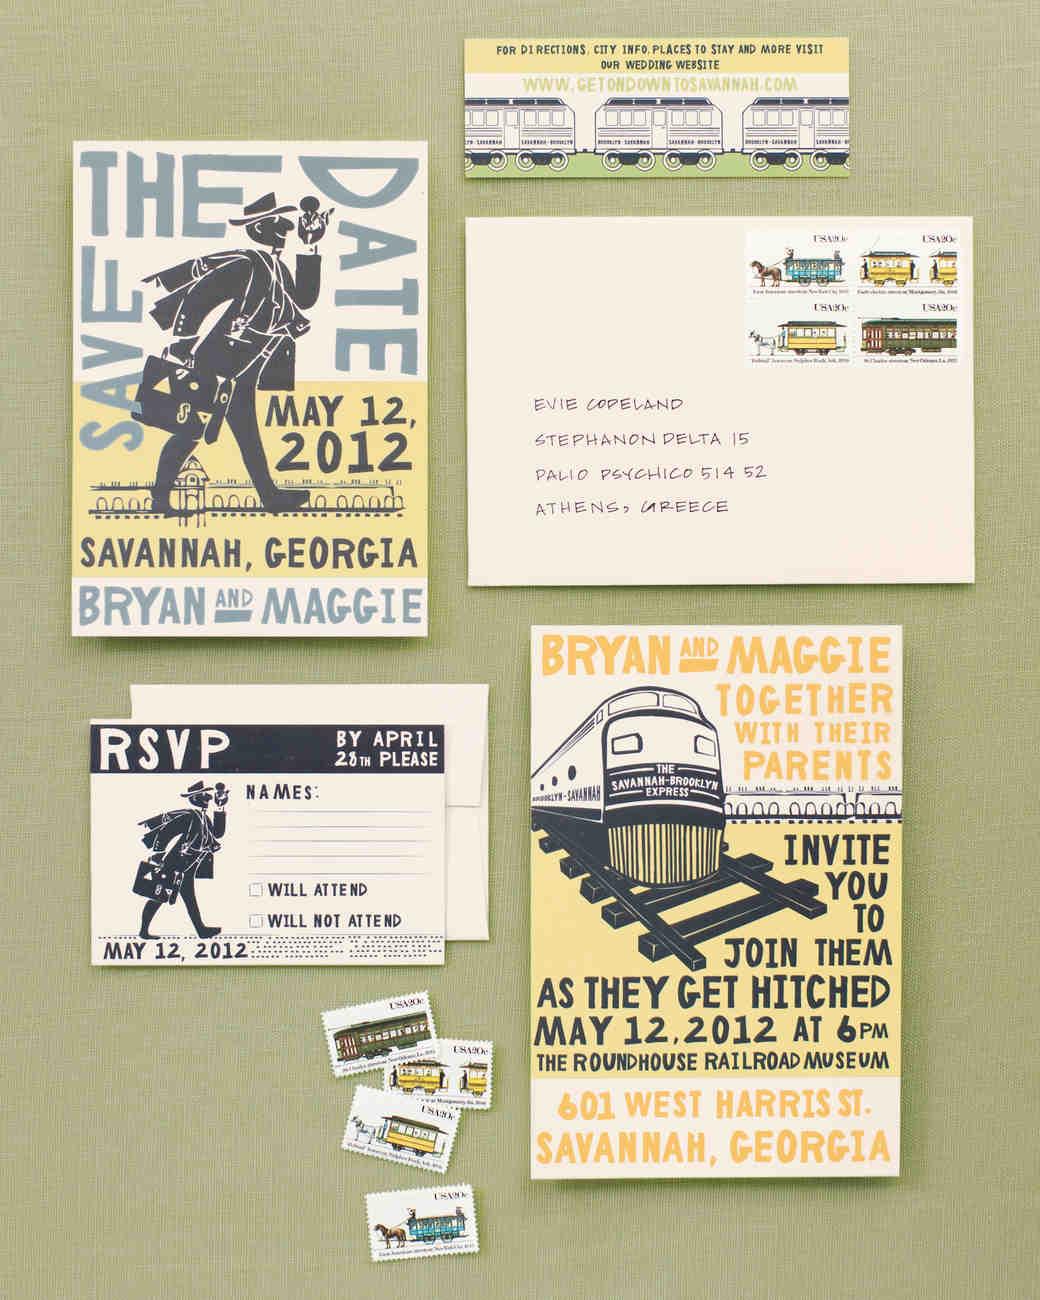 maggie-bryan-invitation-0005-mwd108897.jpg